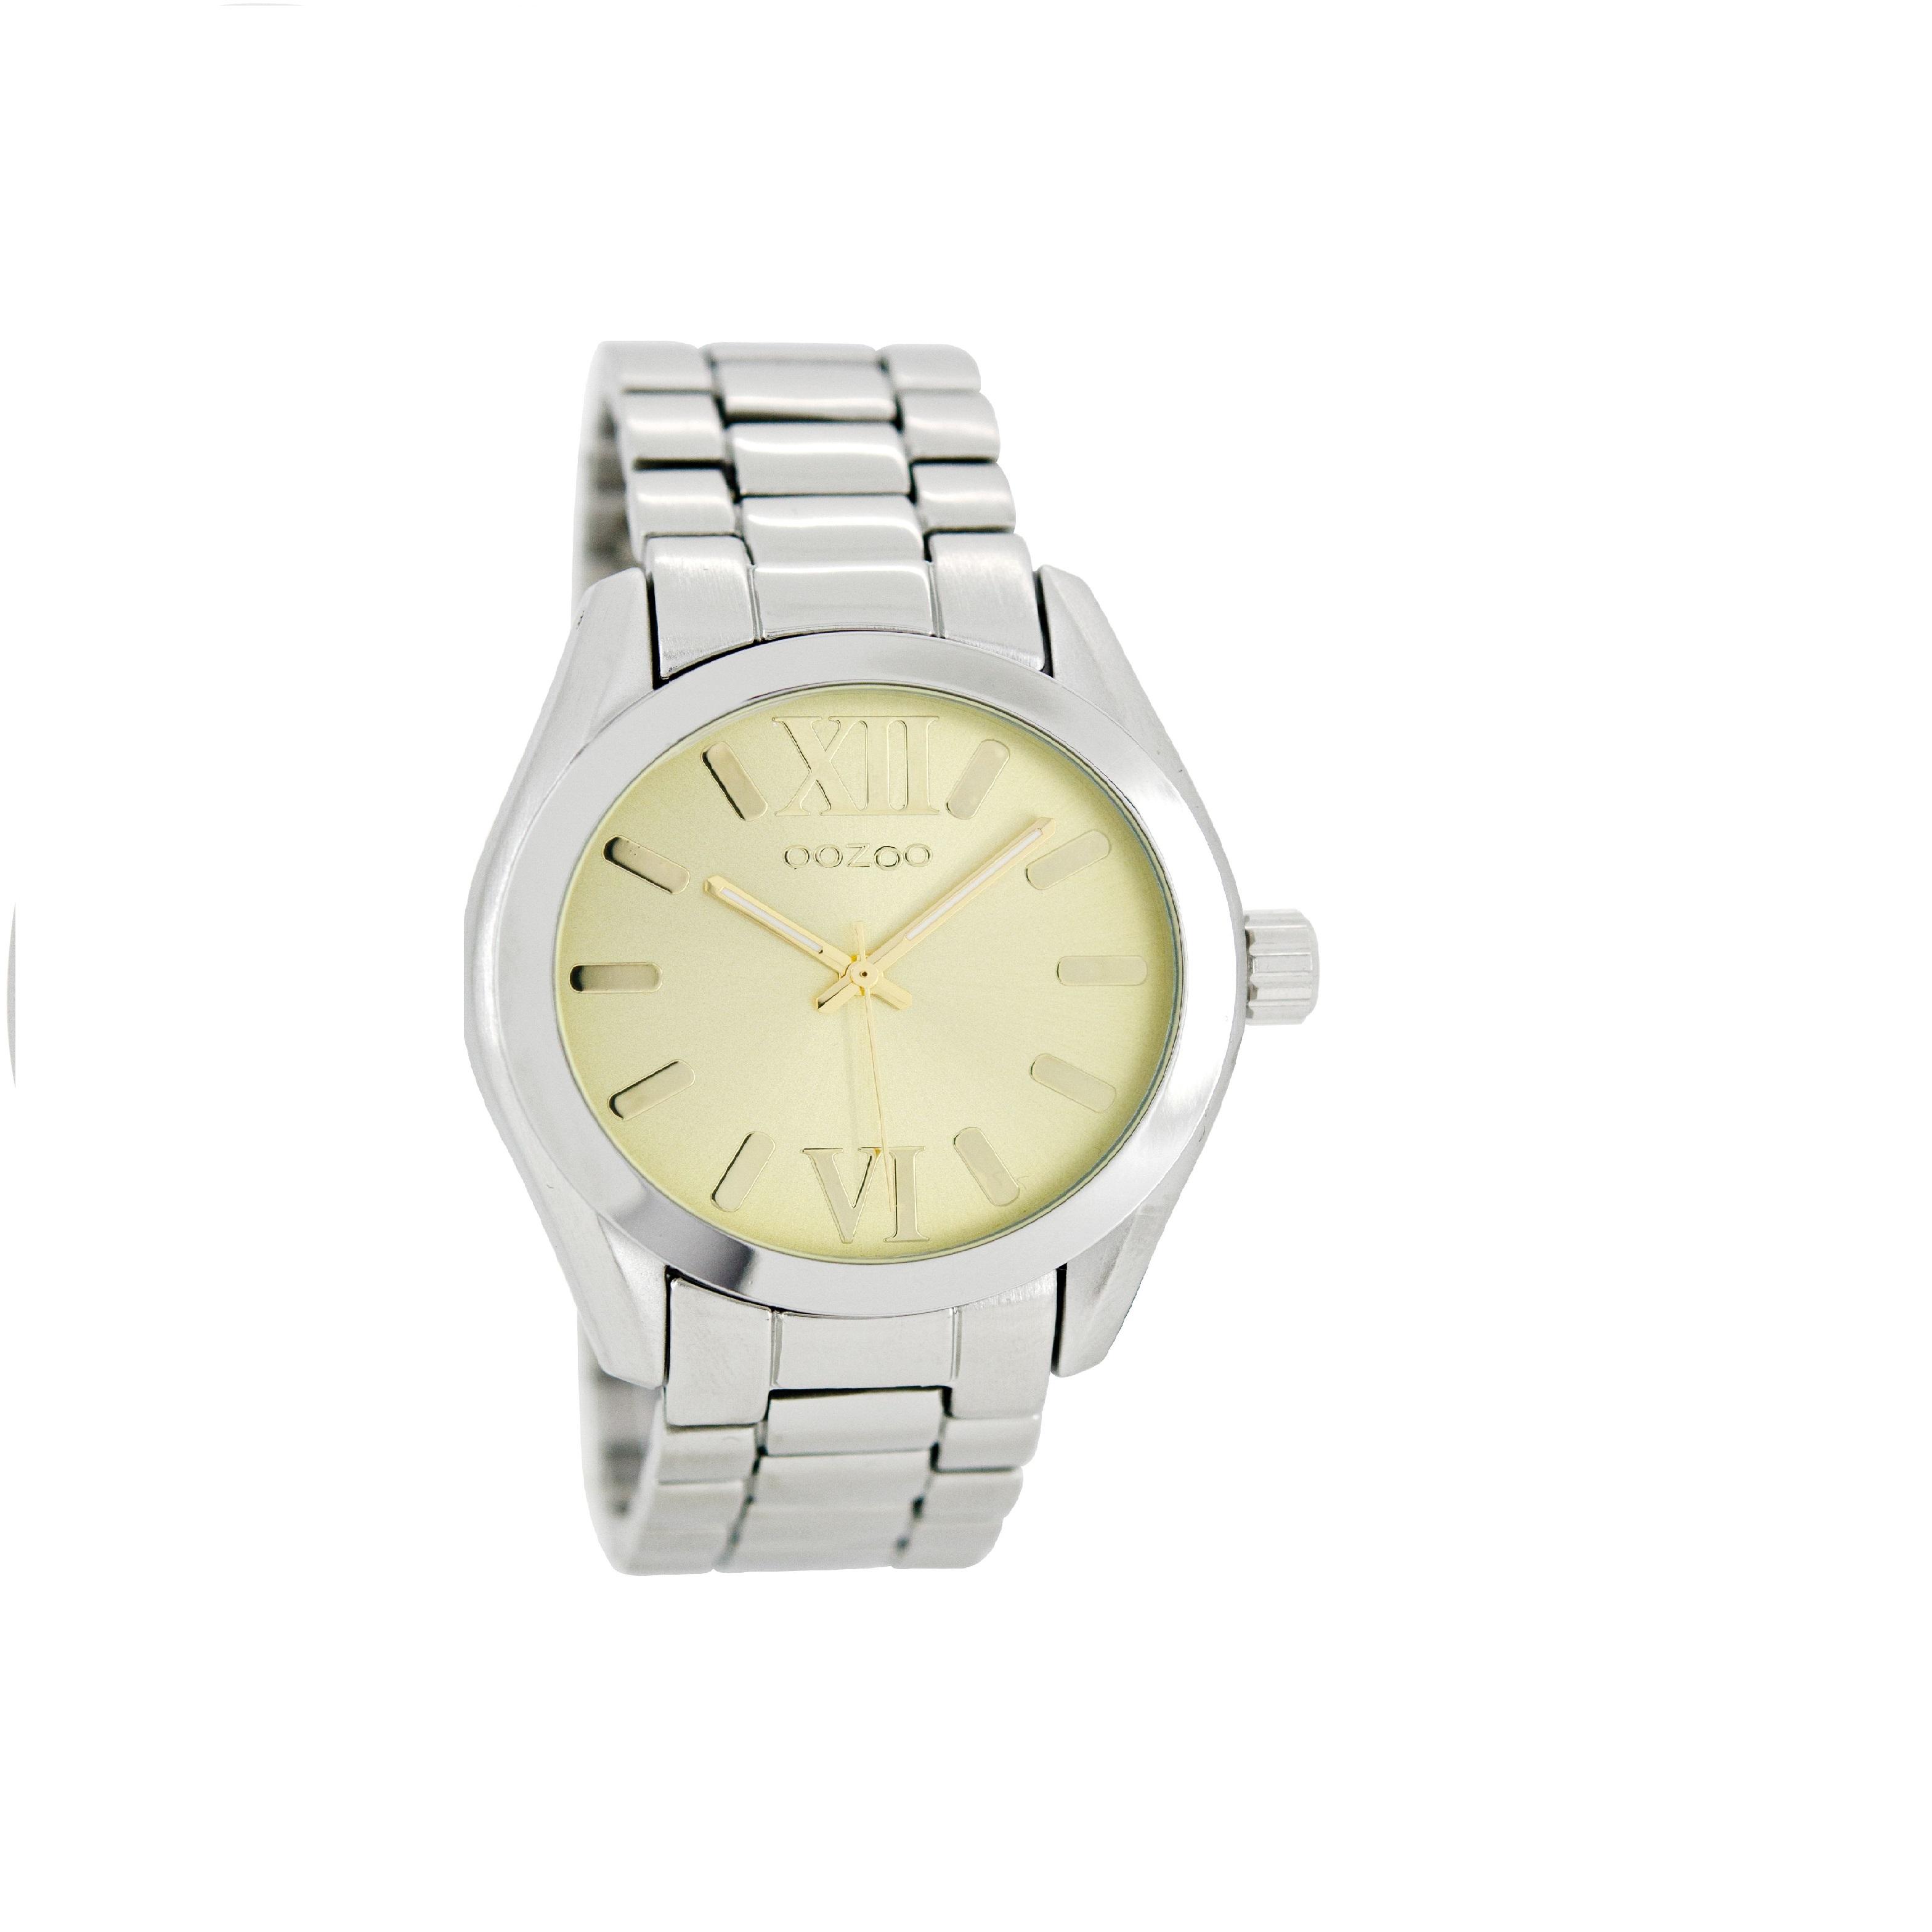 OOZOO - Γυναικείο ρολόι OOZOO TIMEPIECES ασημί απόχρωση 4ddc5613bd8